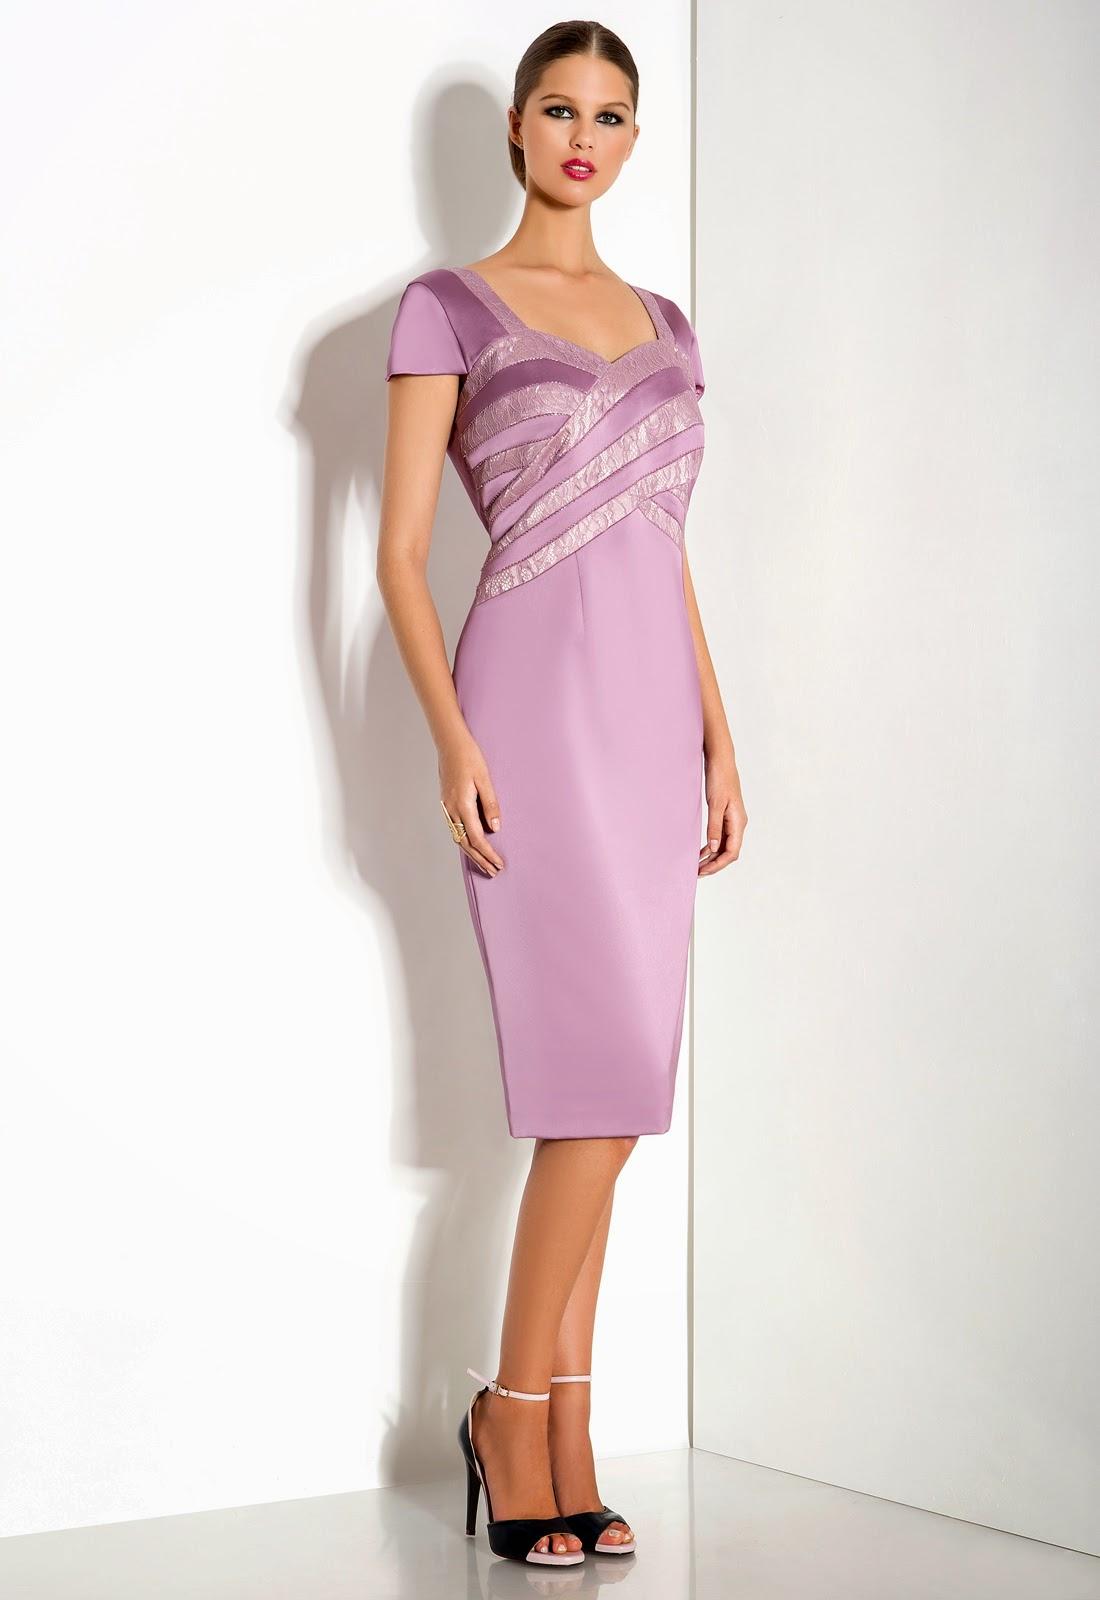 Brautmutter, Bräutigammutter Etuikleid, elegantes Kleid mit Ärmel